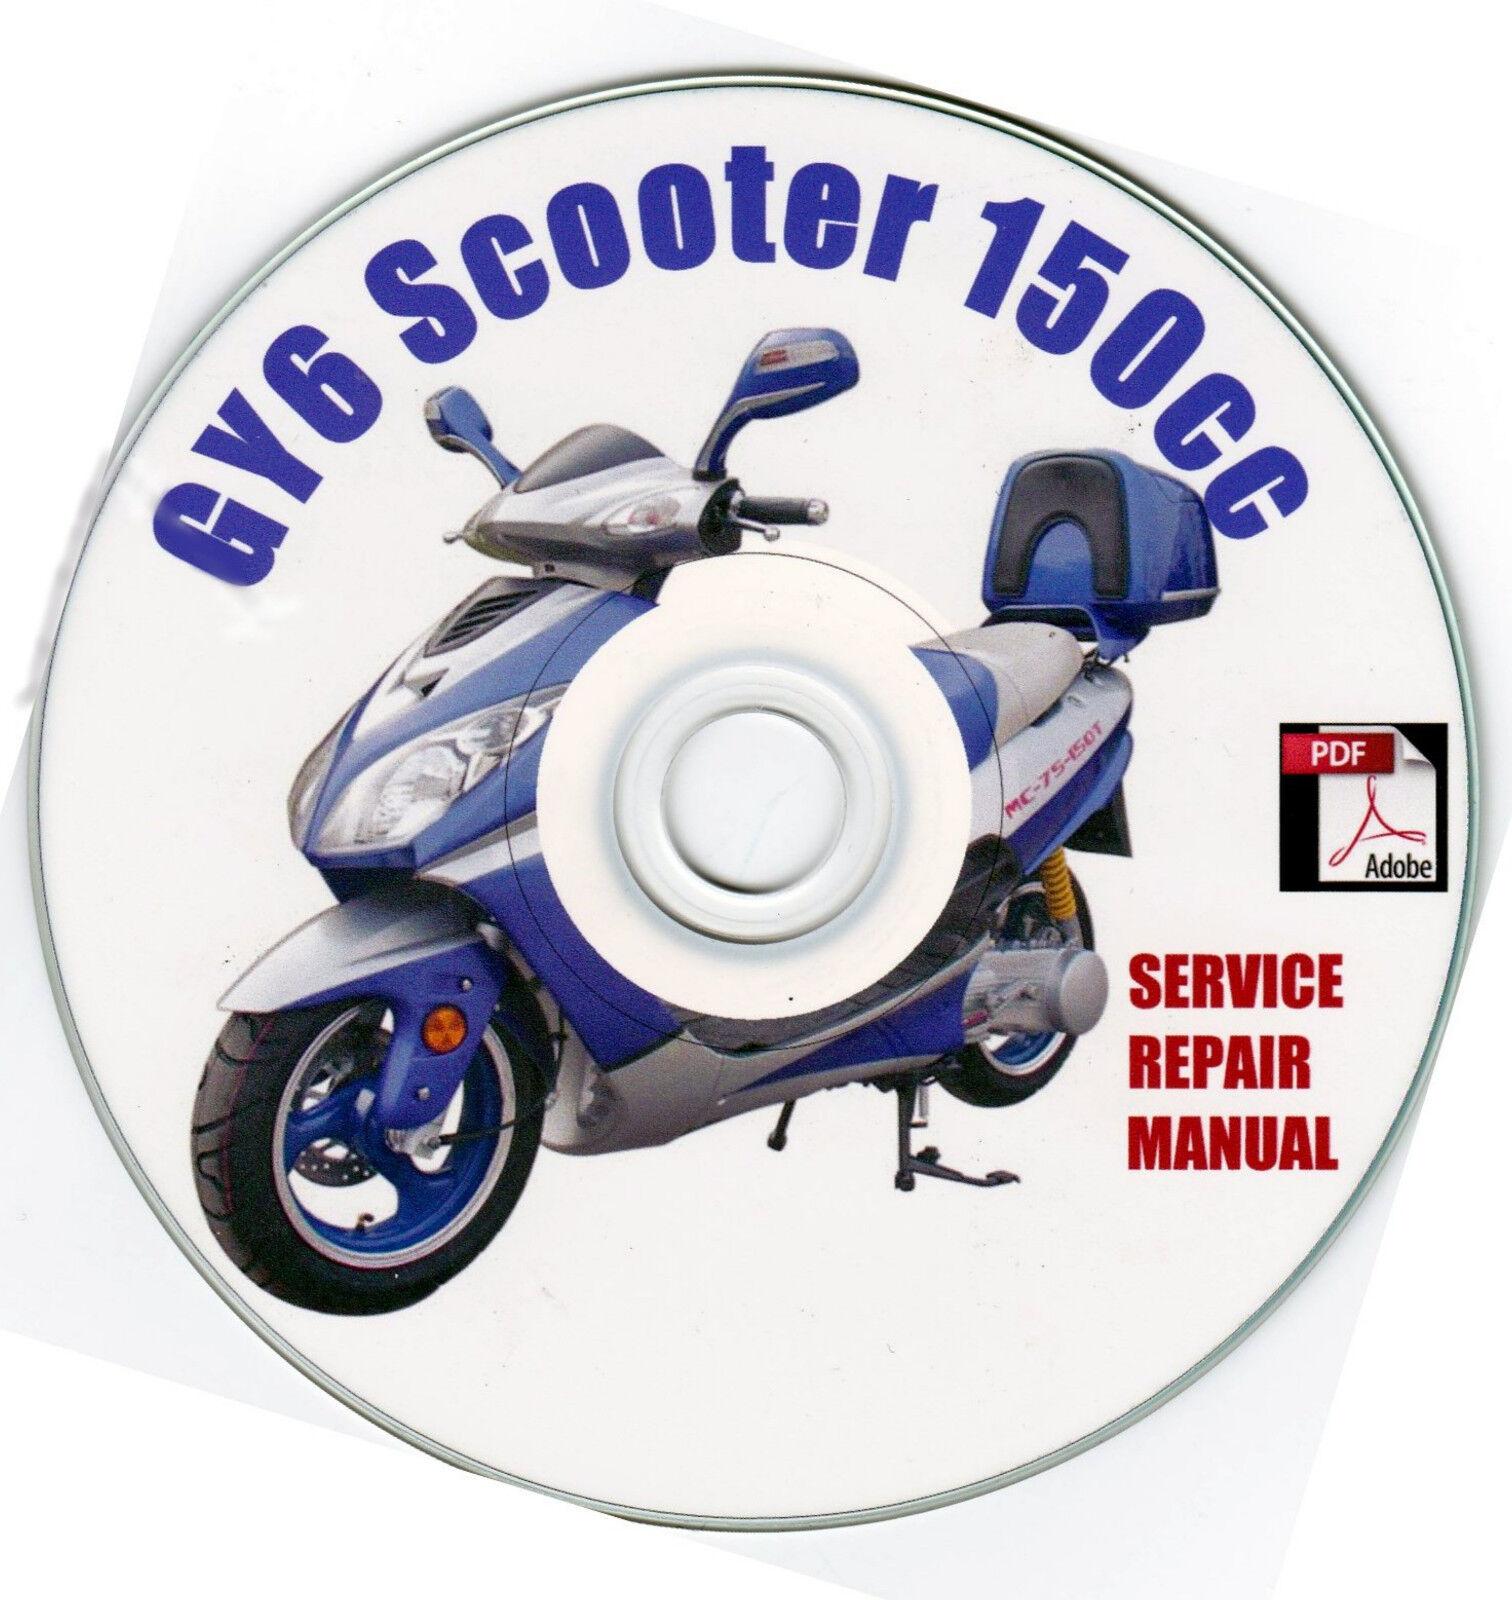 scooter 150cc gy6 qmj service repair shop manual on cd vip peace rh ebay com VIP Future Champion Scooter Manual Peace Sports Scooter Model 1978